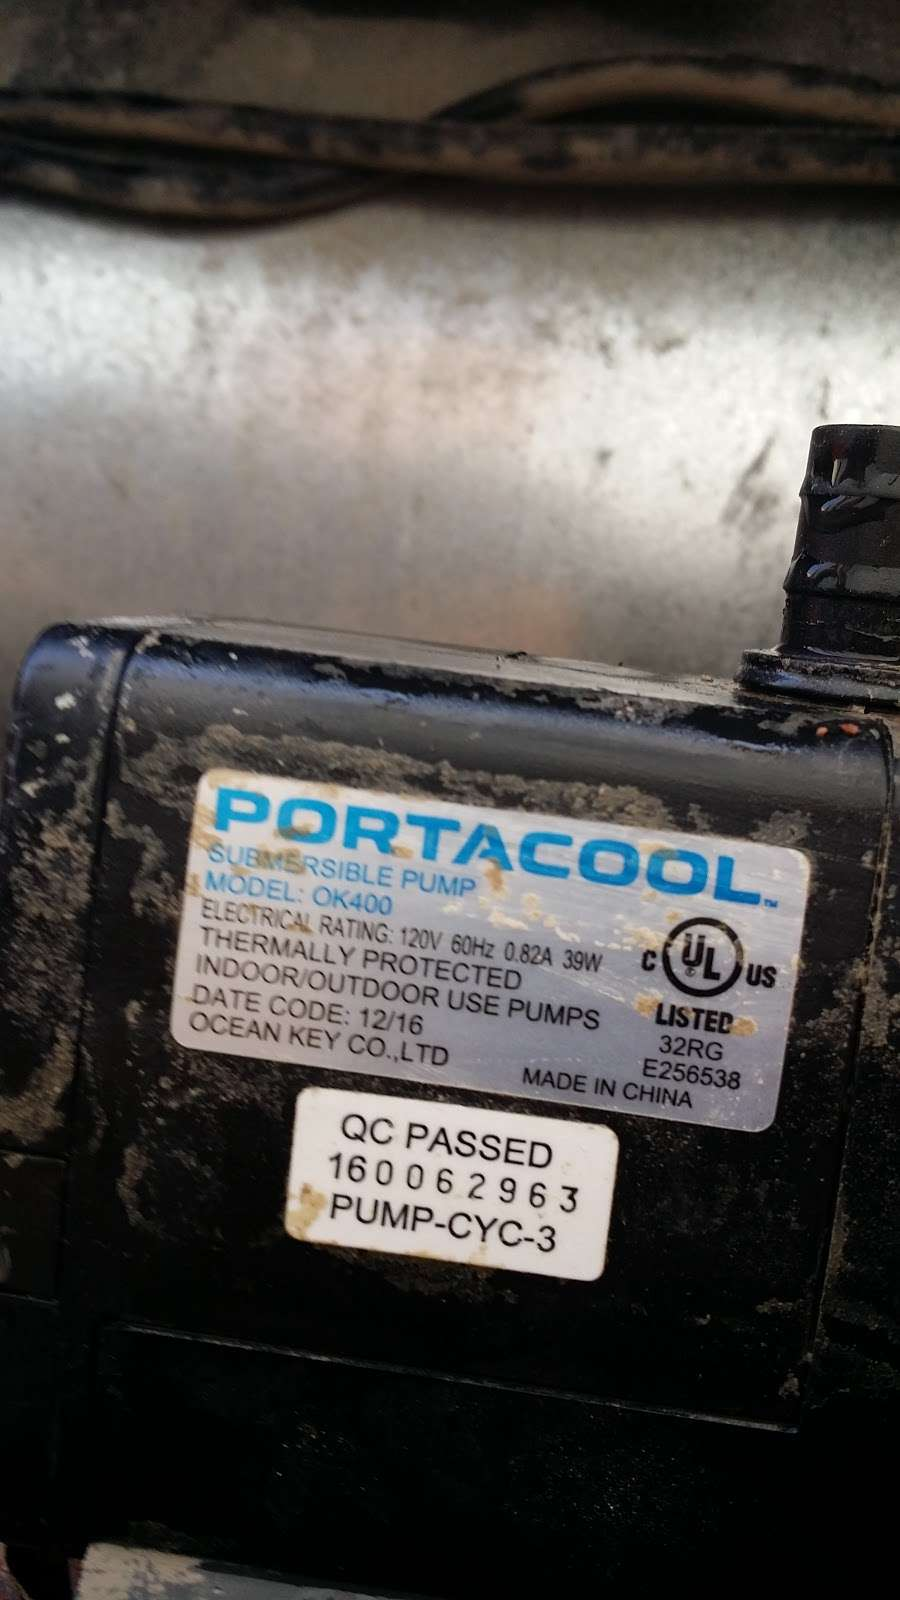 B & G Auto Sales - Car repair | 876 E Tonto St, Phoenix, AZ